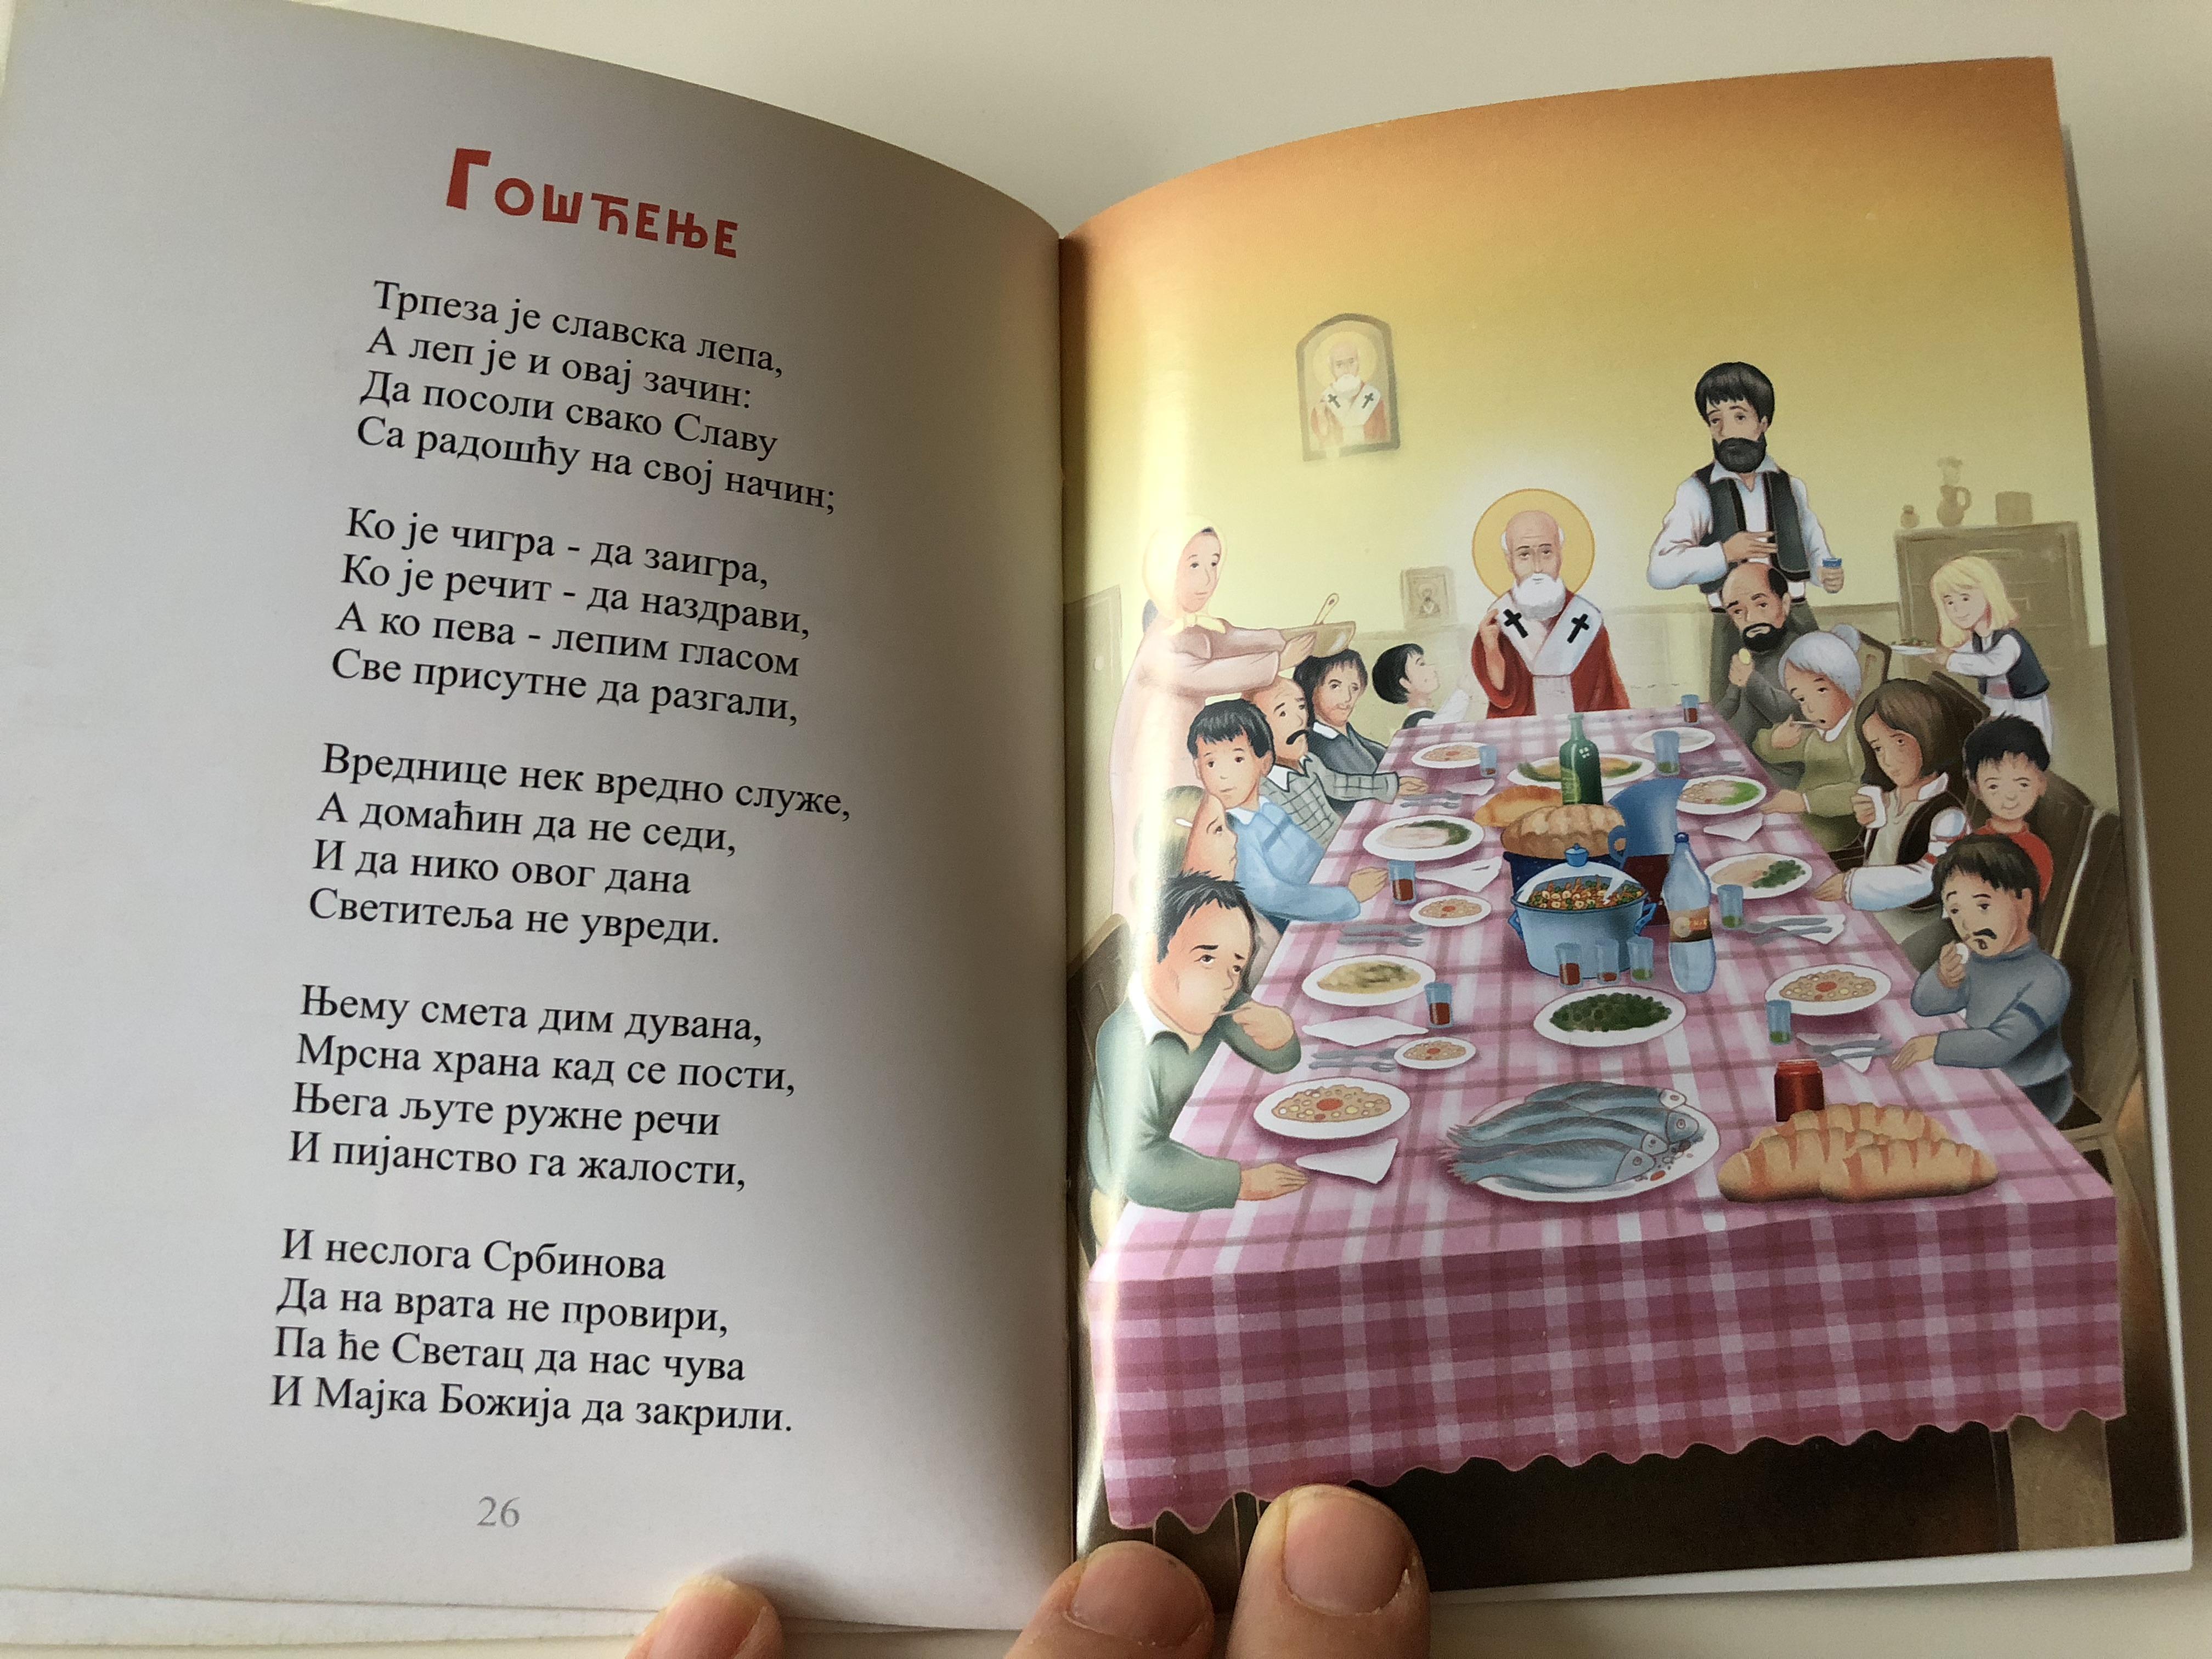 serbian-childrens-poems-orthodox-feasts-7-.jpg